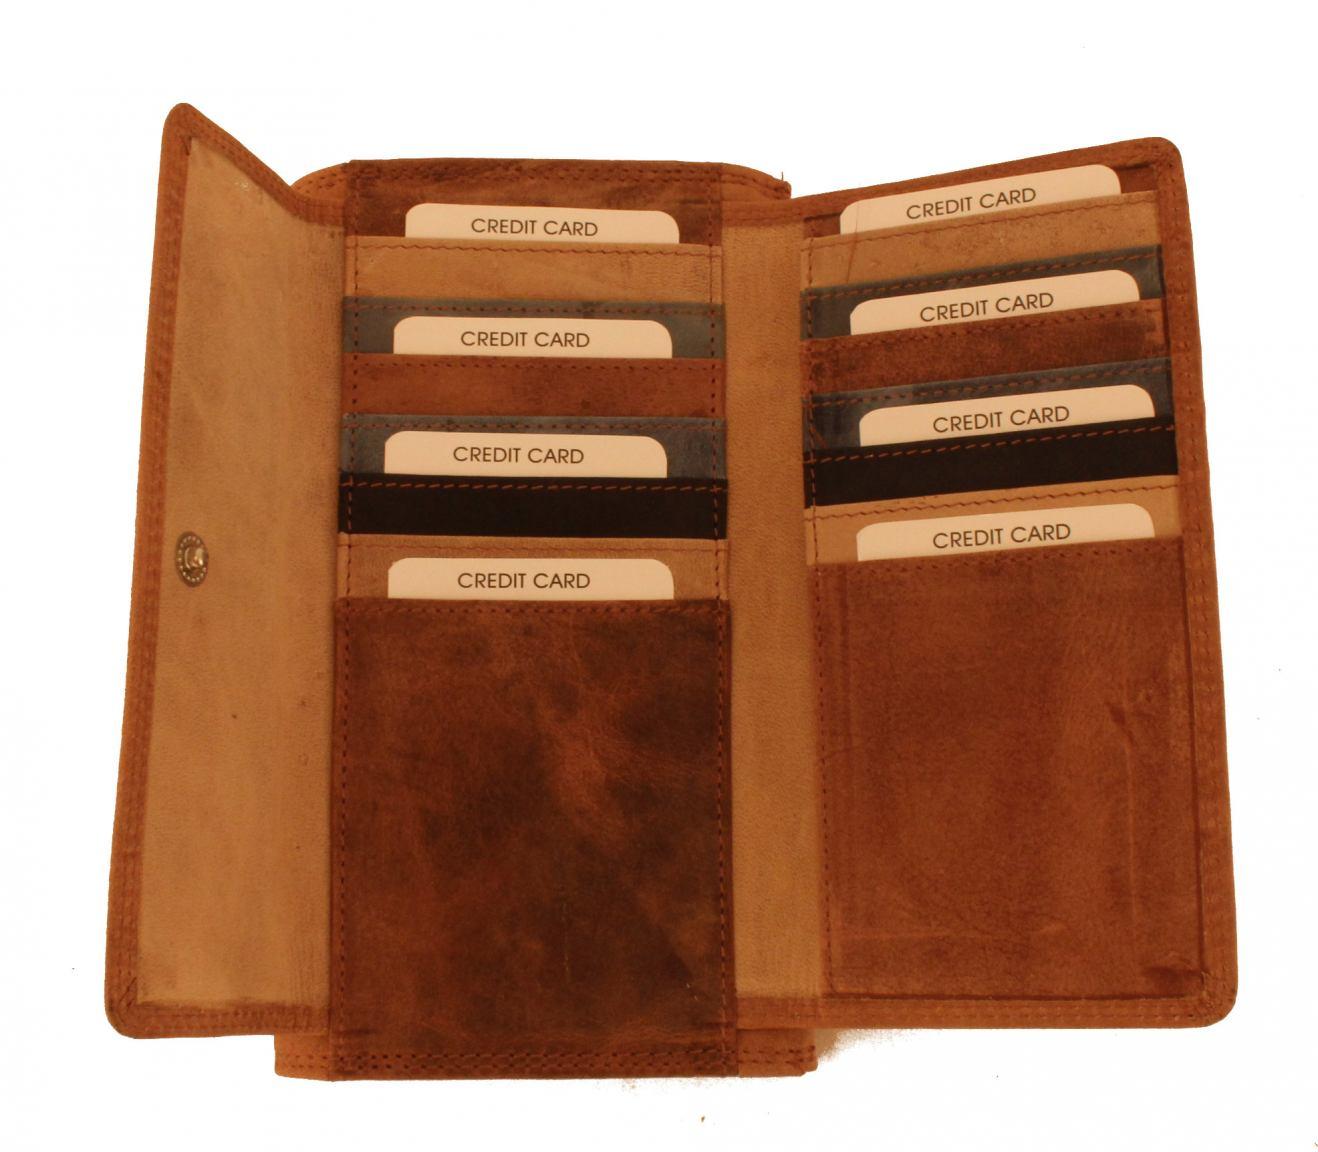 Burkely Lederbörse Überschlag Braun Vintage 2nd Hand